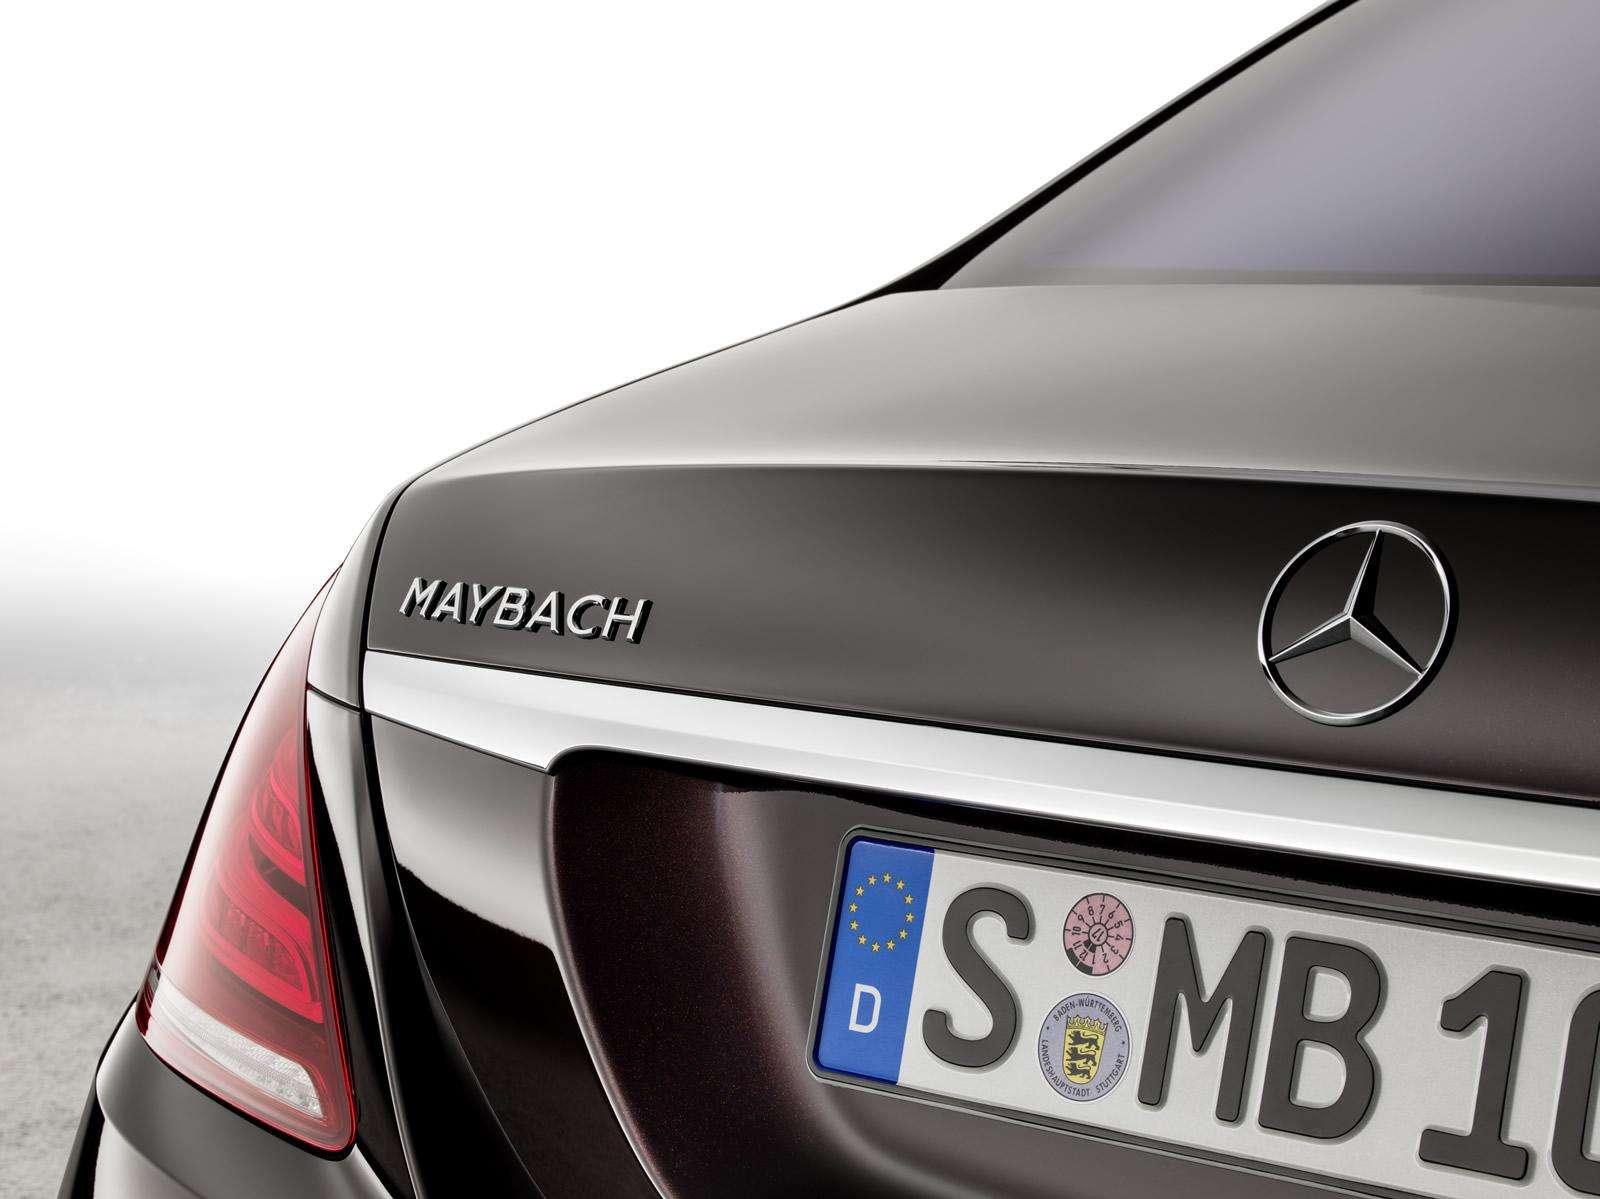 Maybach 2014